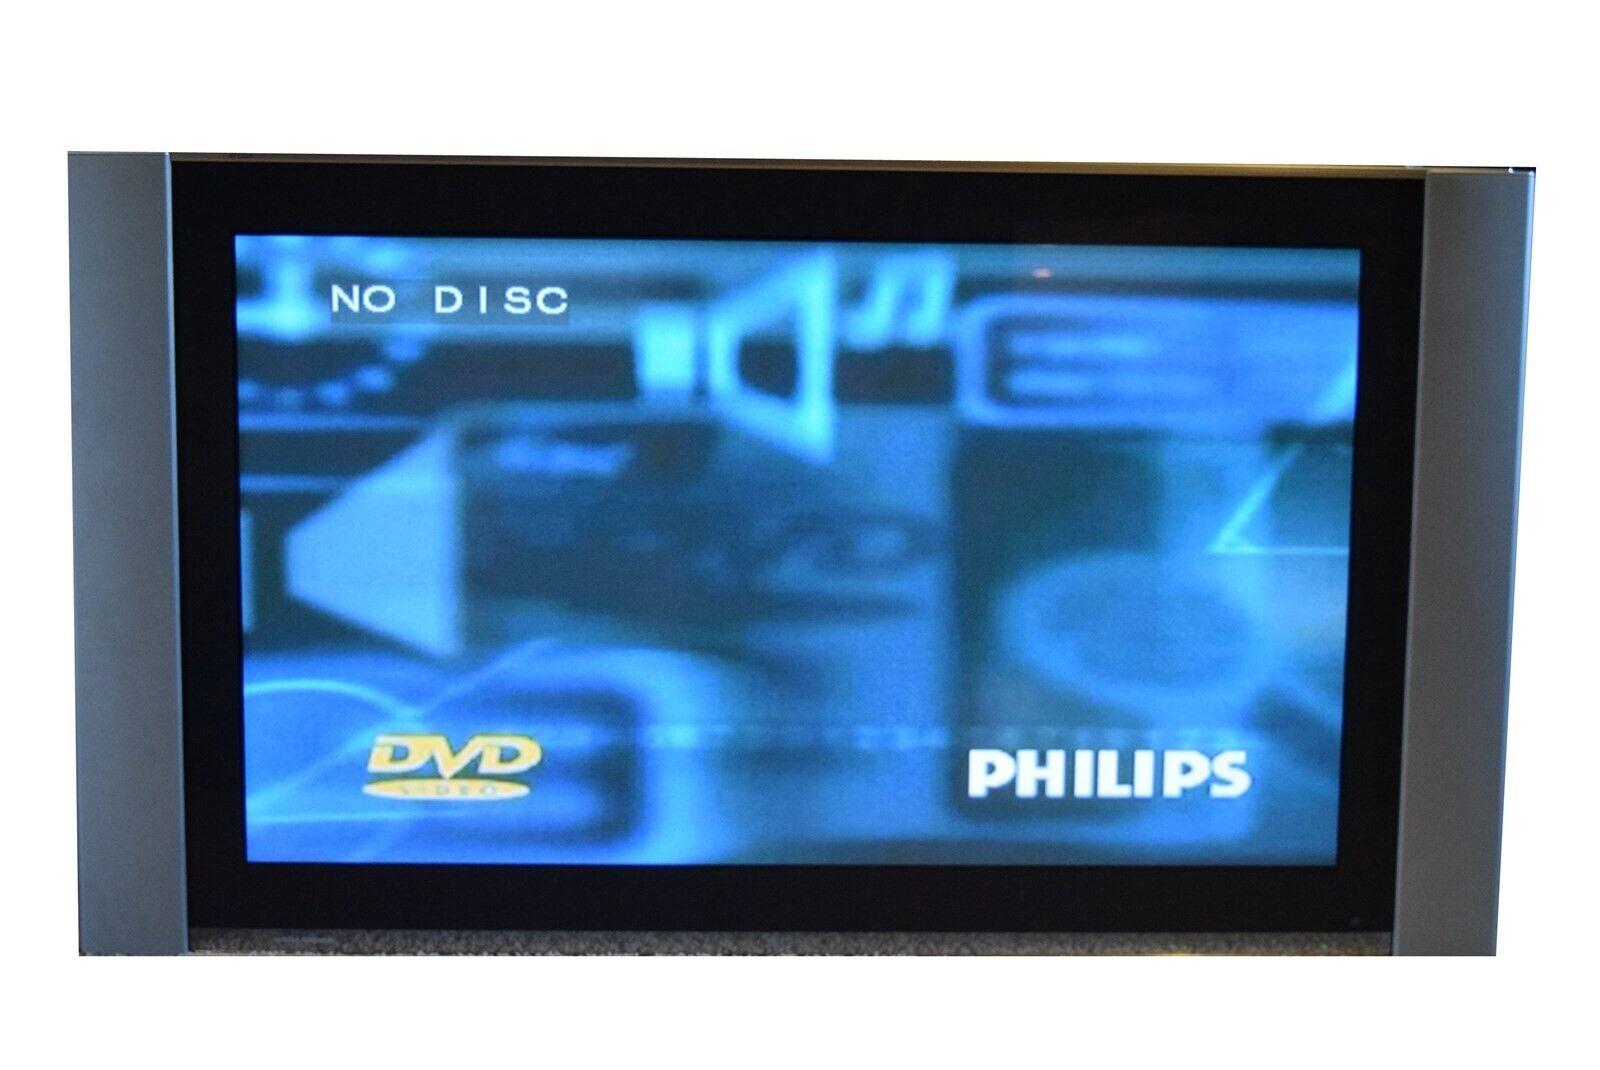 Sony Wega KE-50XS910 50-Inch WEGA Flat-Panel Plasma HDTV with DTV Tuner